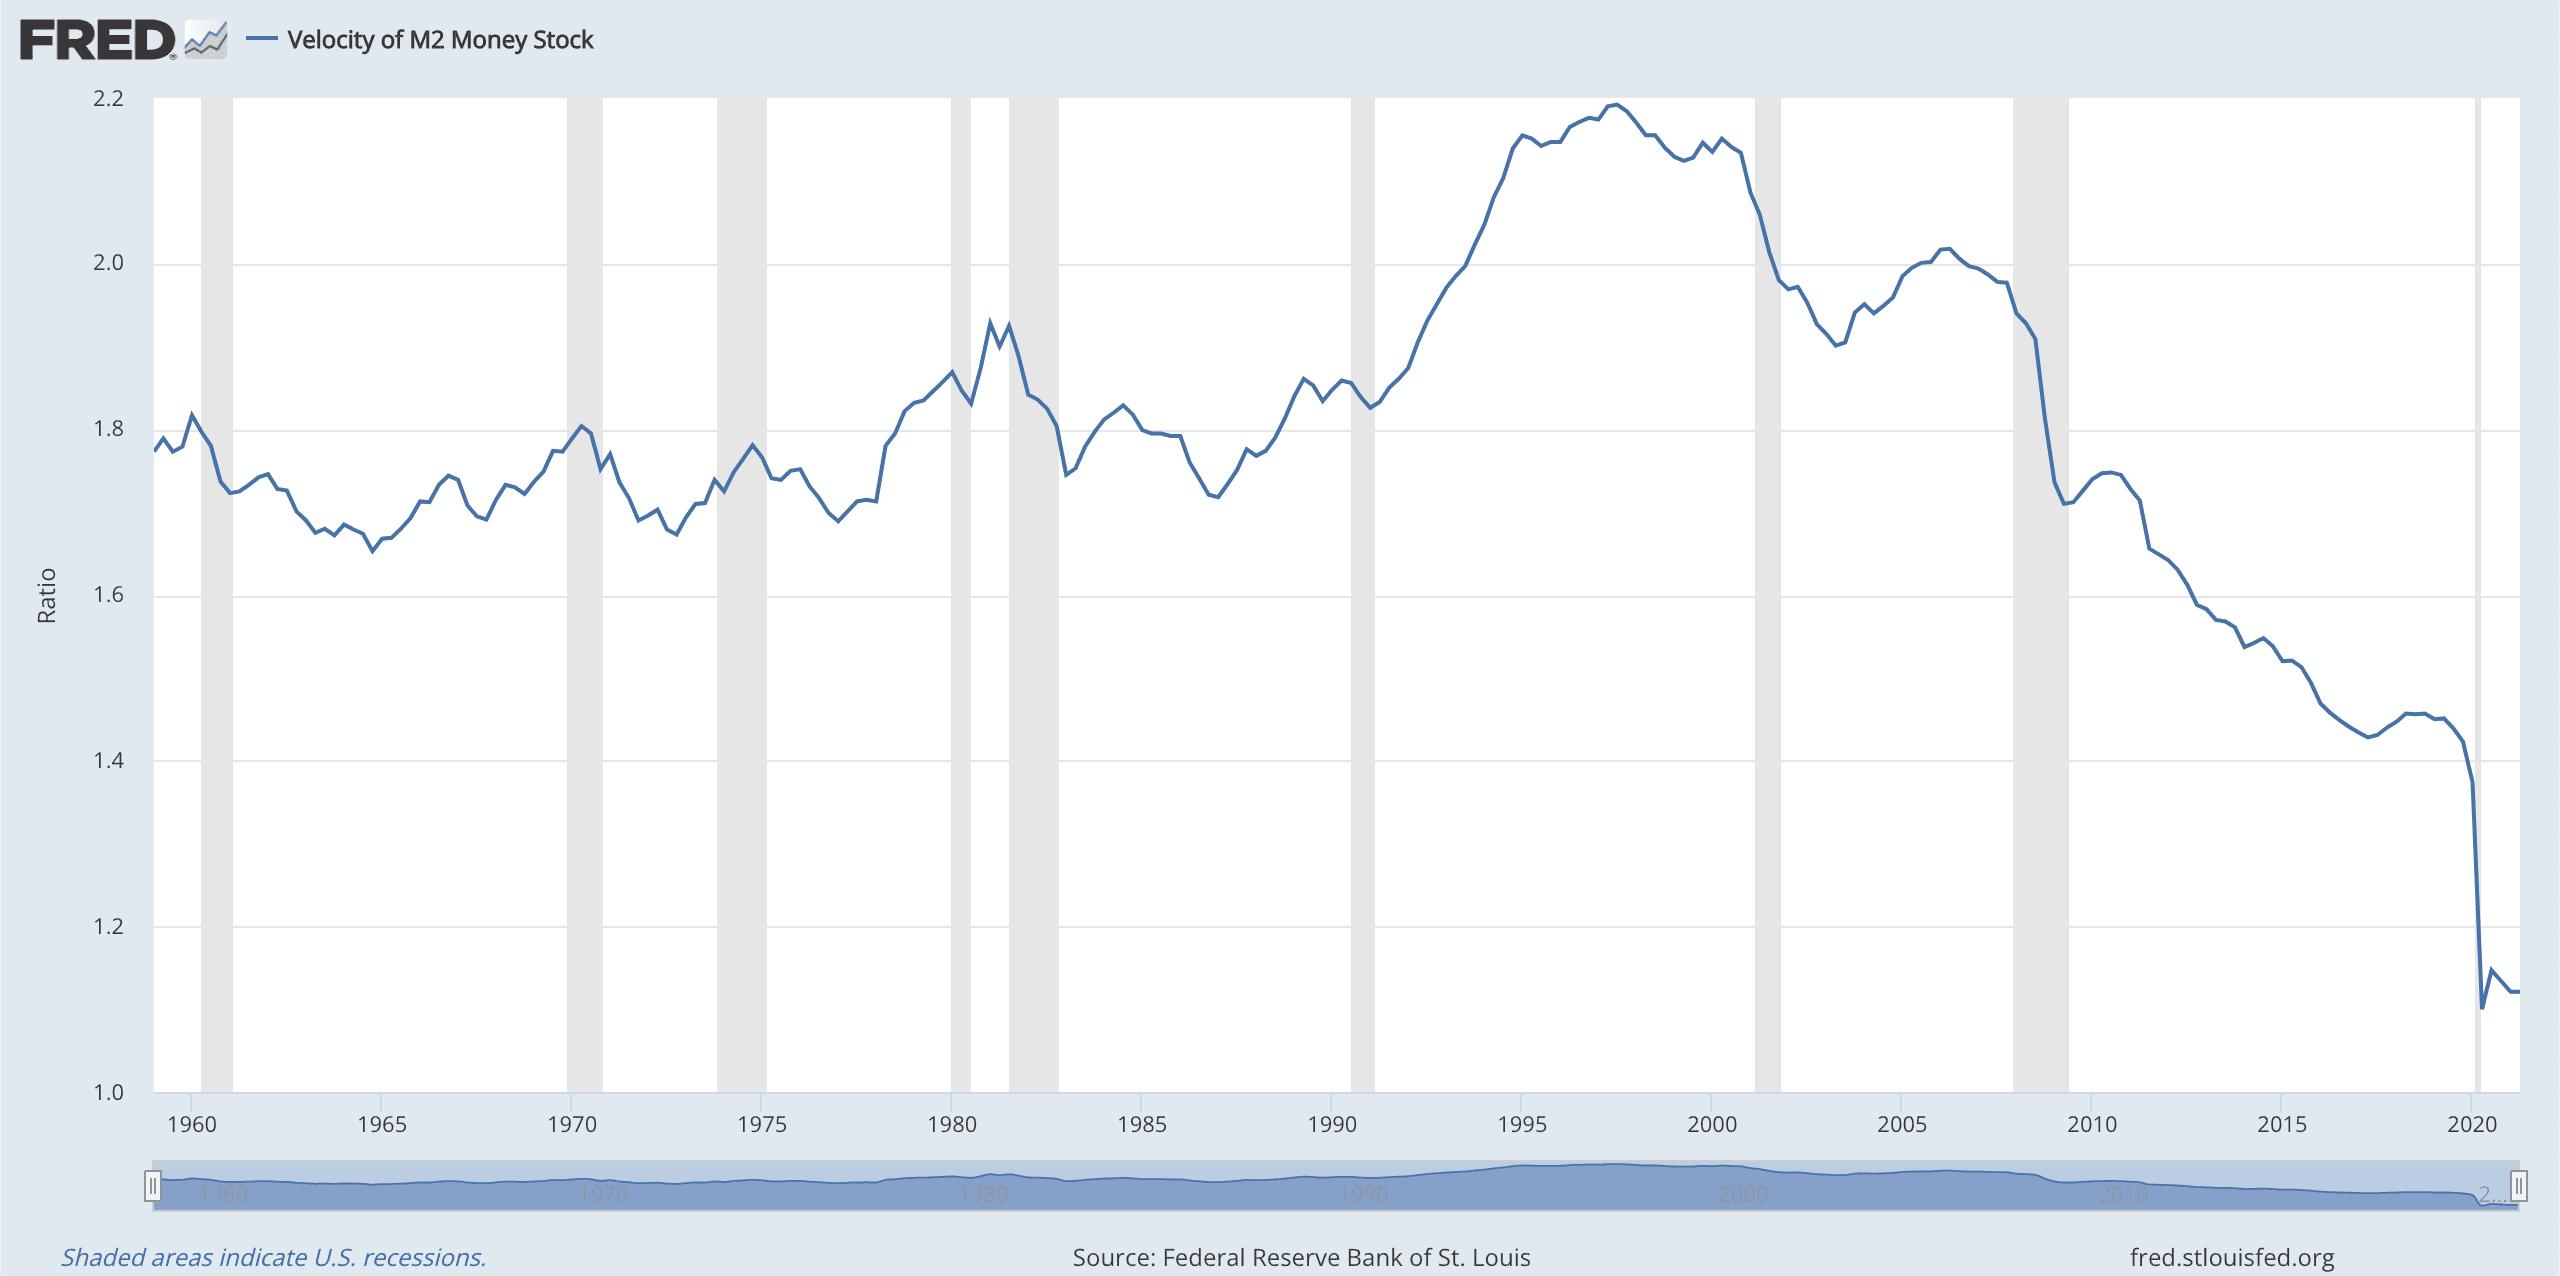 Velocity of M2 Money Supply